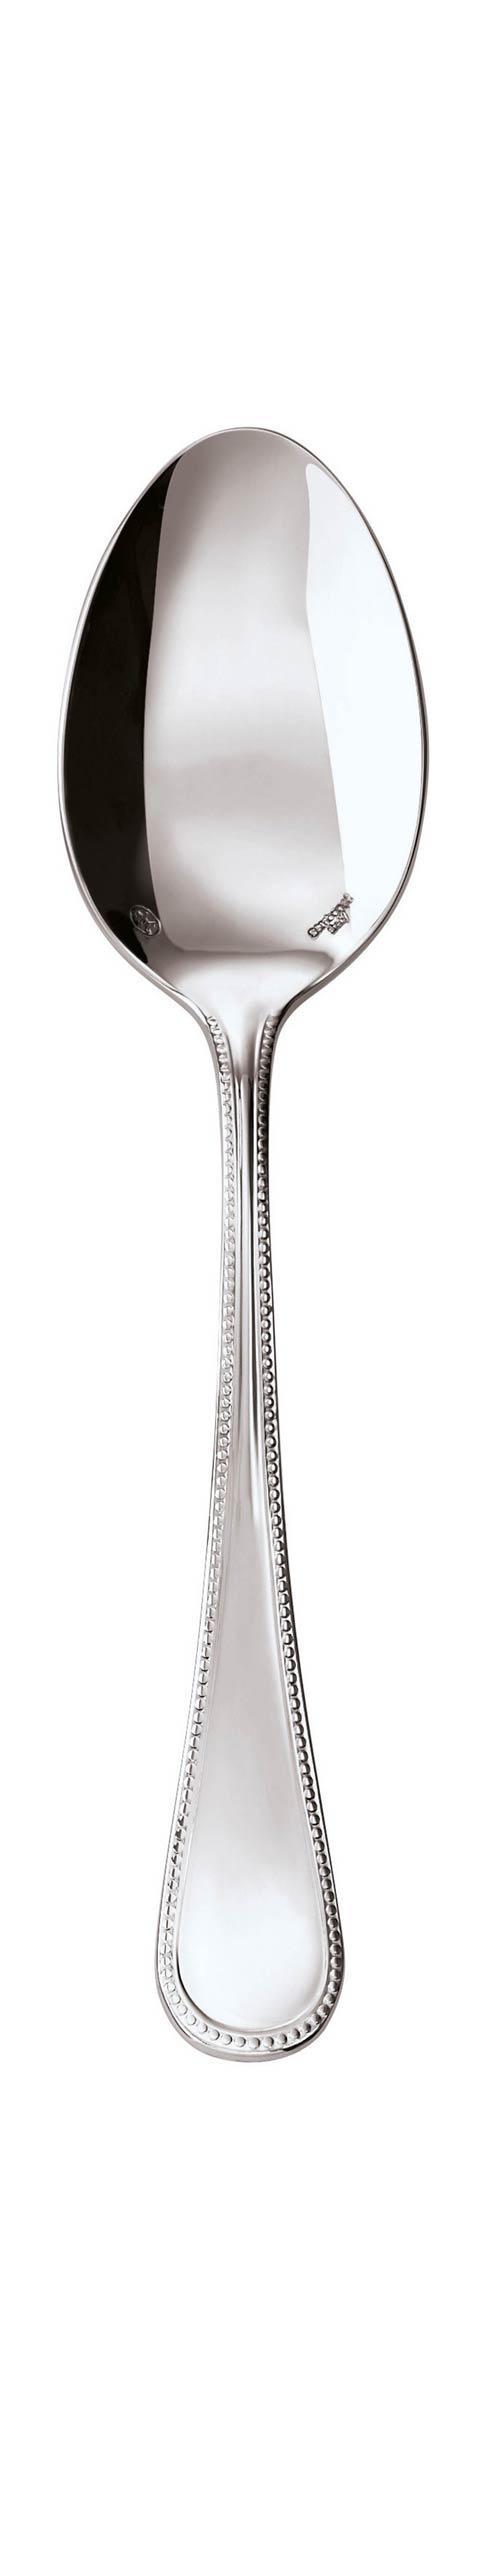 $12.00 Dessert Spoon